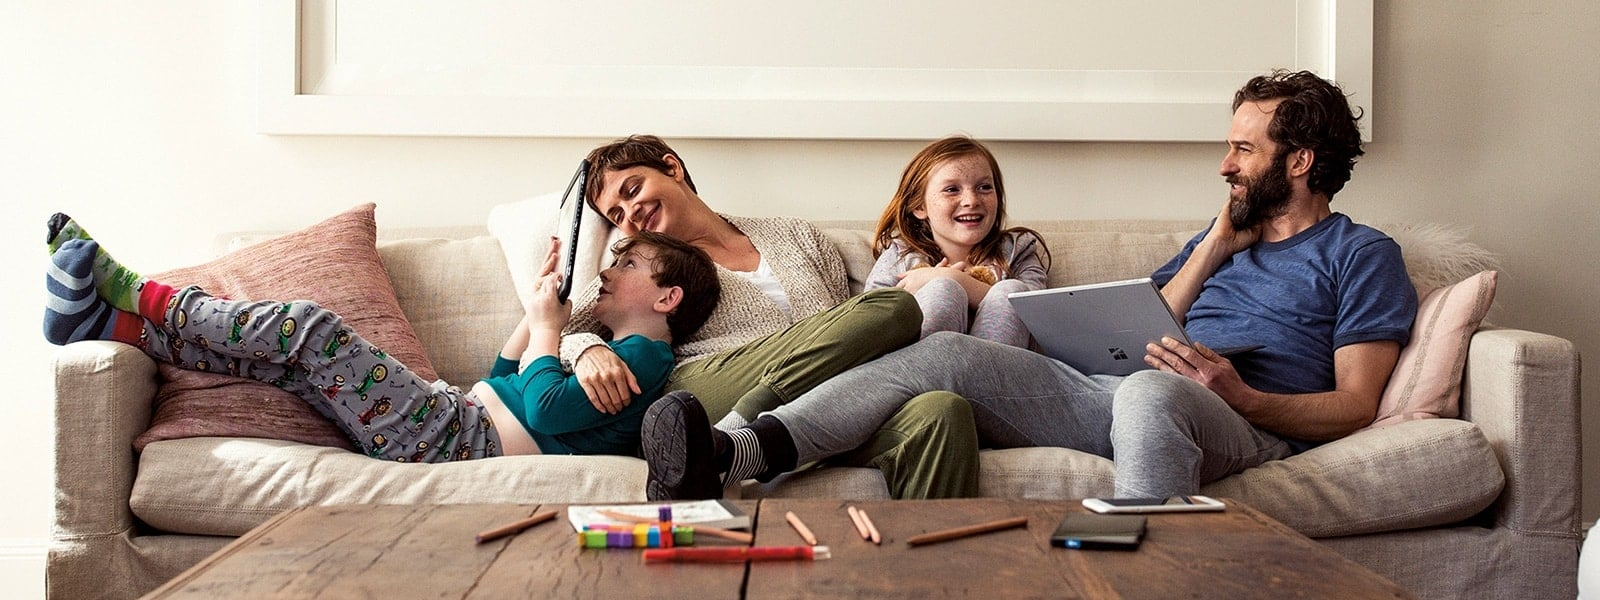 Družina, ki leži na kavču.